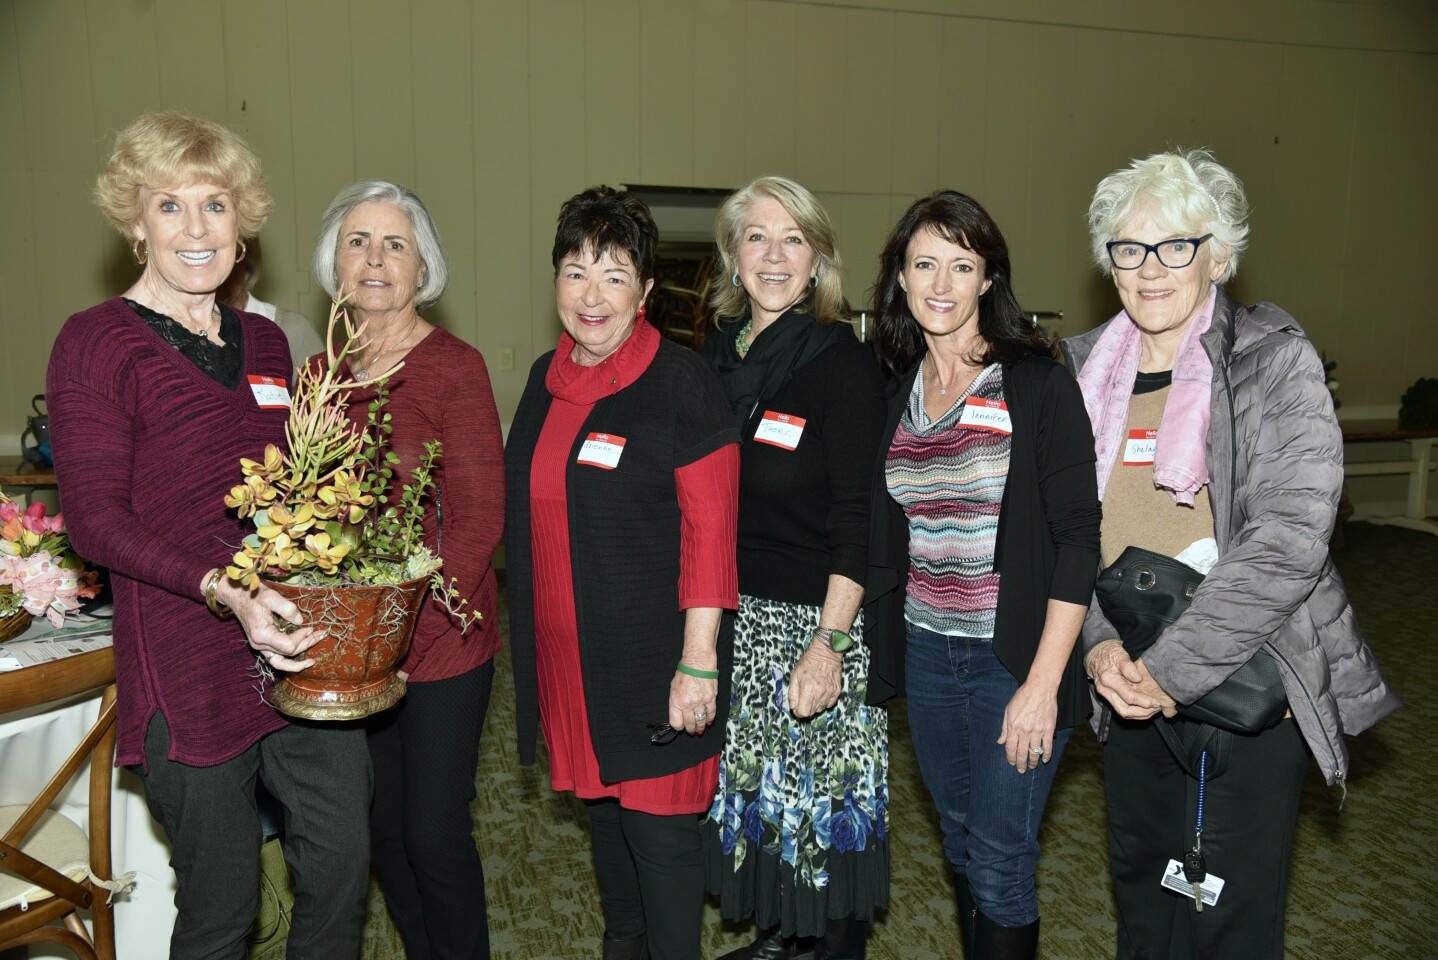 Katie Fish, Suzanne Ingrao, board member Adrienne Falzon, Executive Director Thora Guthrie, President Jennifer Perkinson, Shelagh Keegan